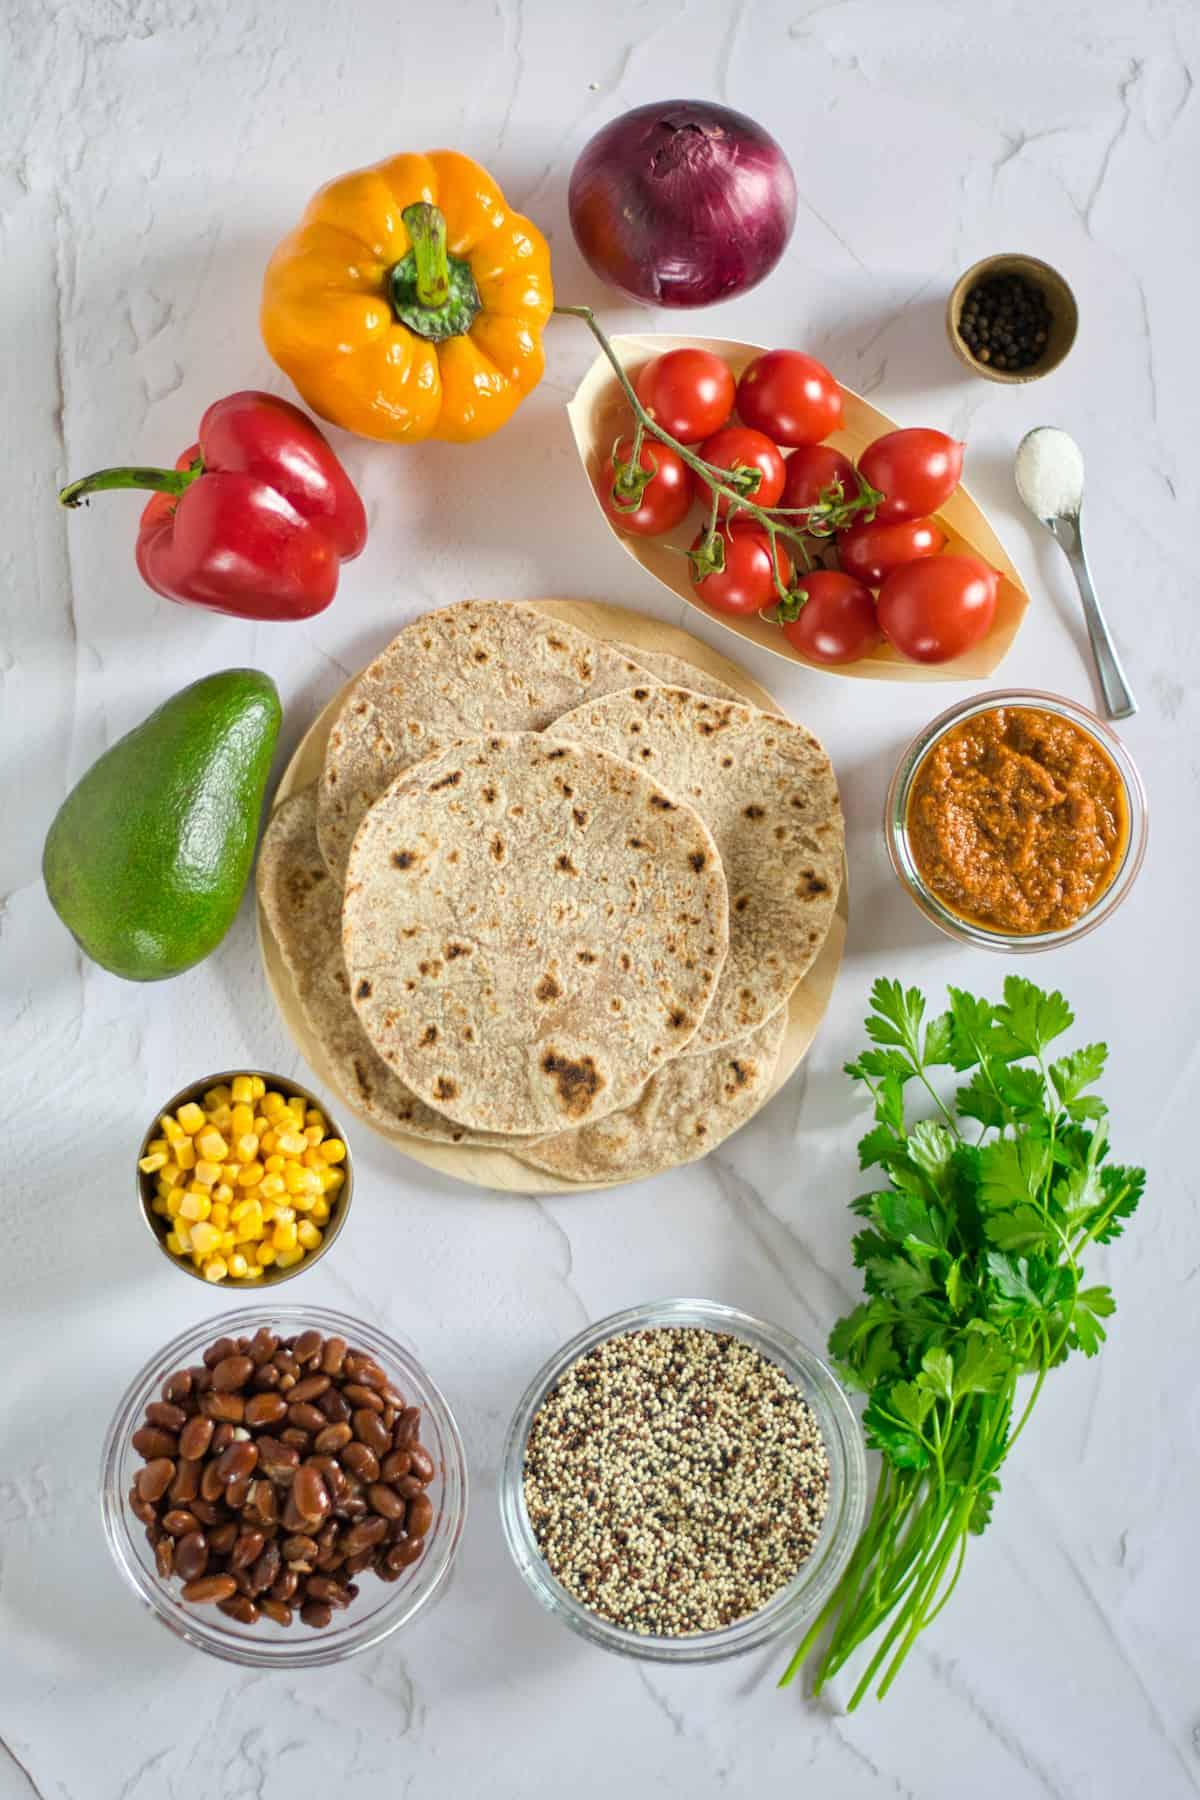 Quinoa, beans, corn, cilantro, tortillas, avocado, peppers, tomatoes, salsa, onion for Quinoa Tacos.